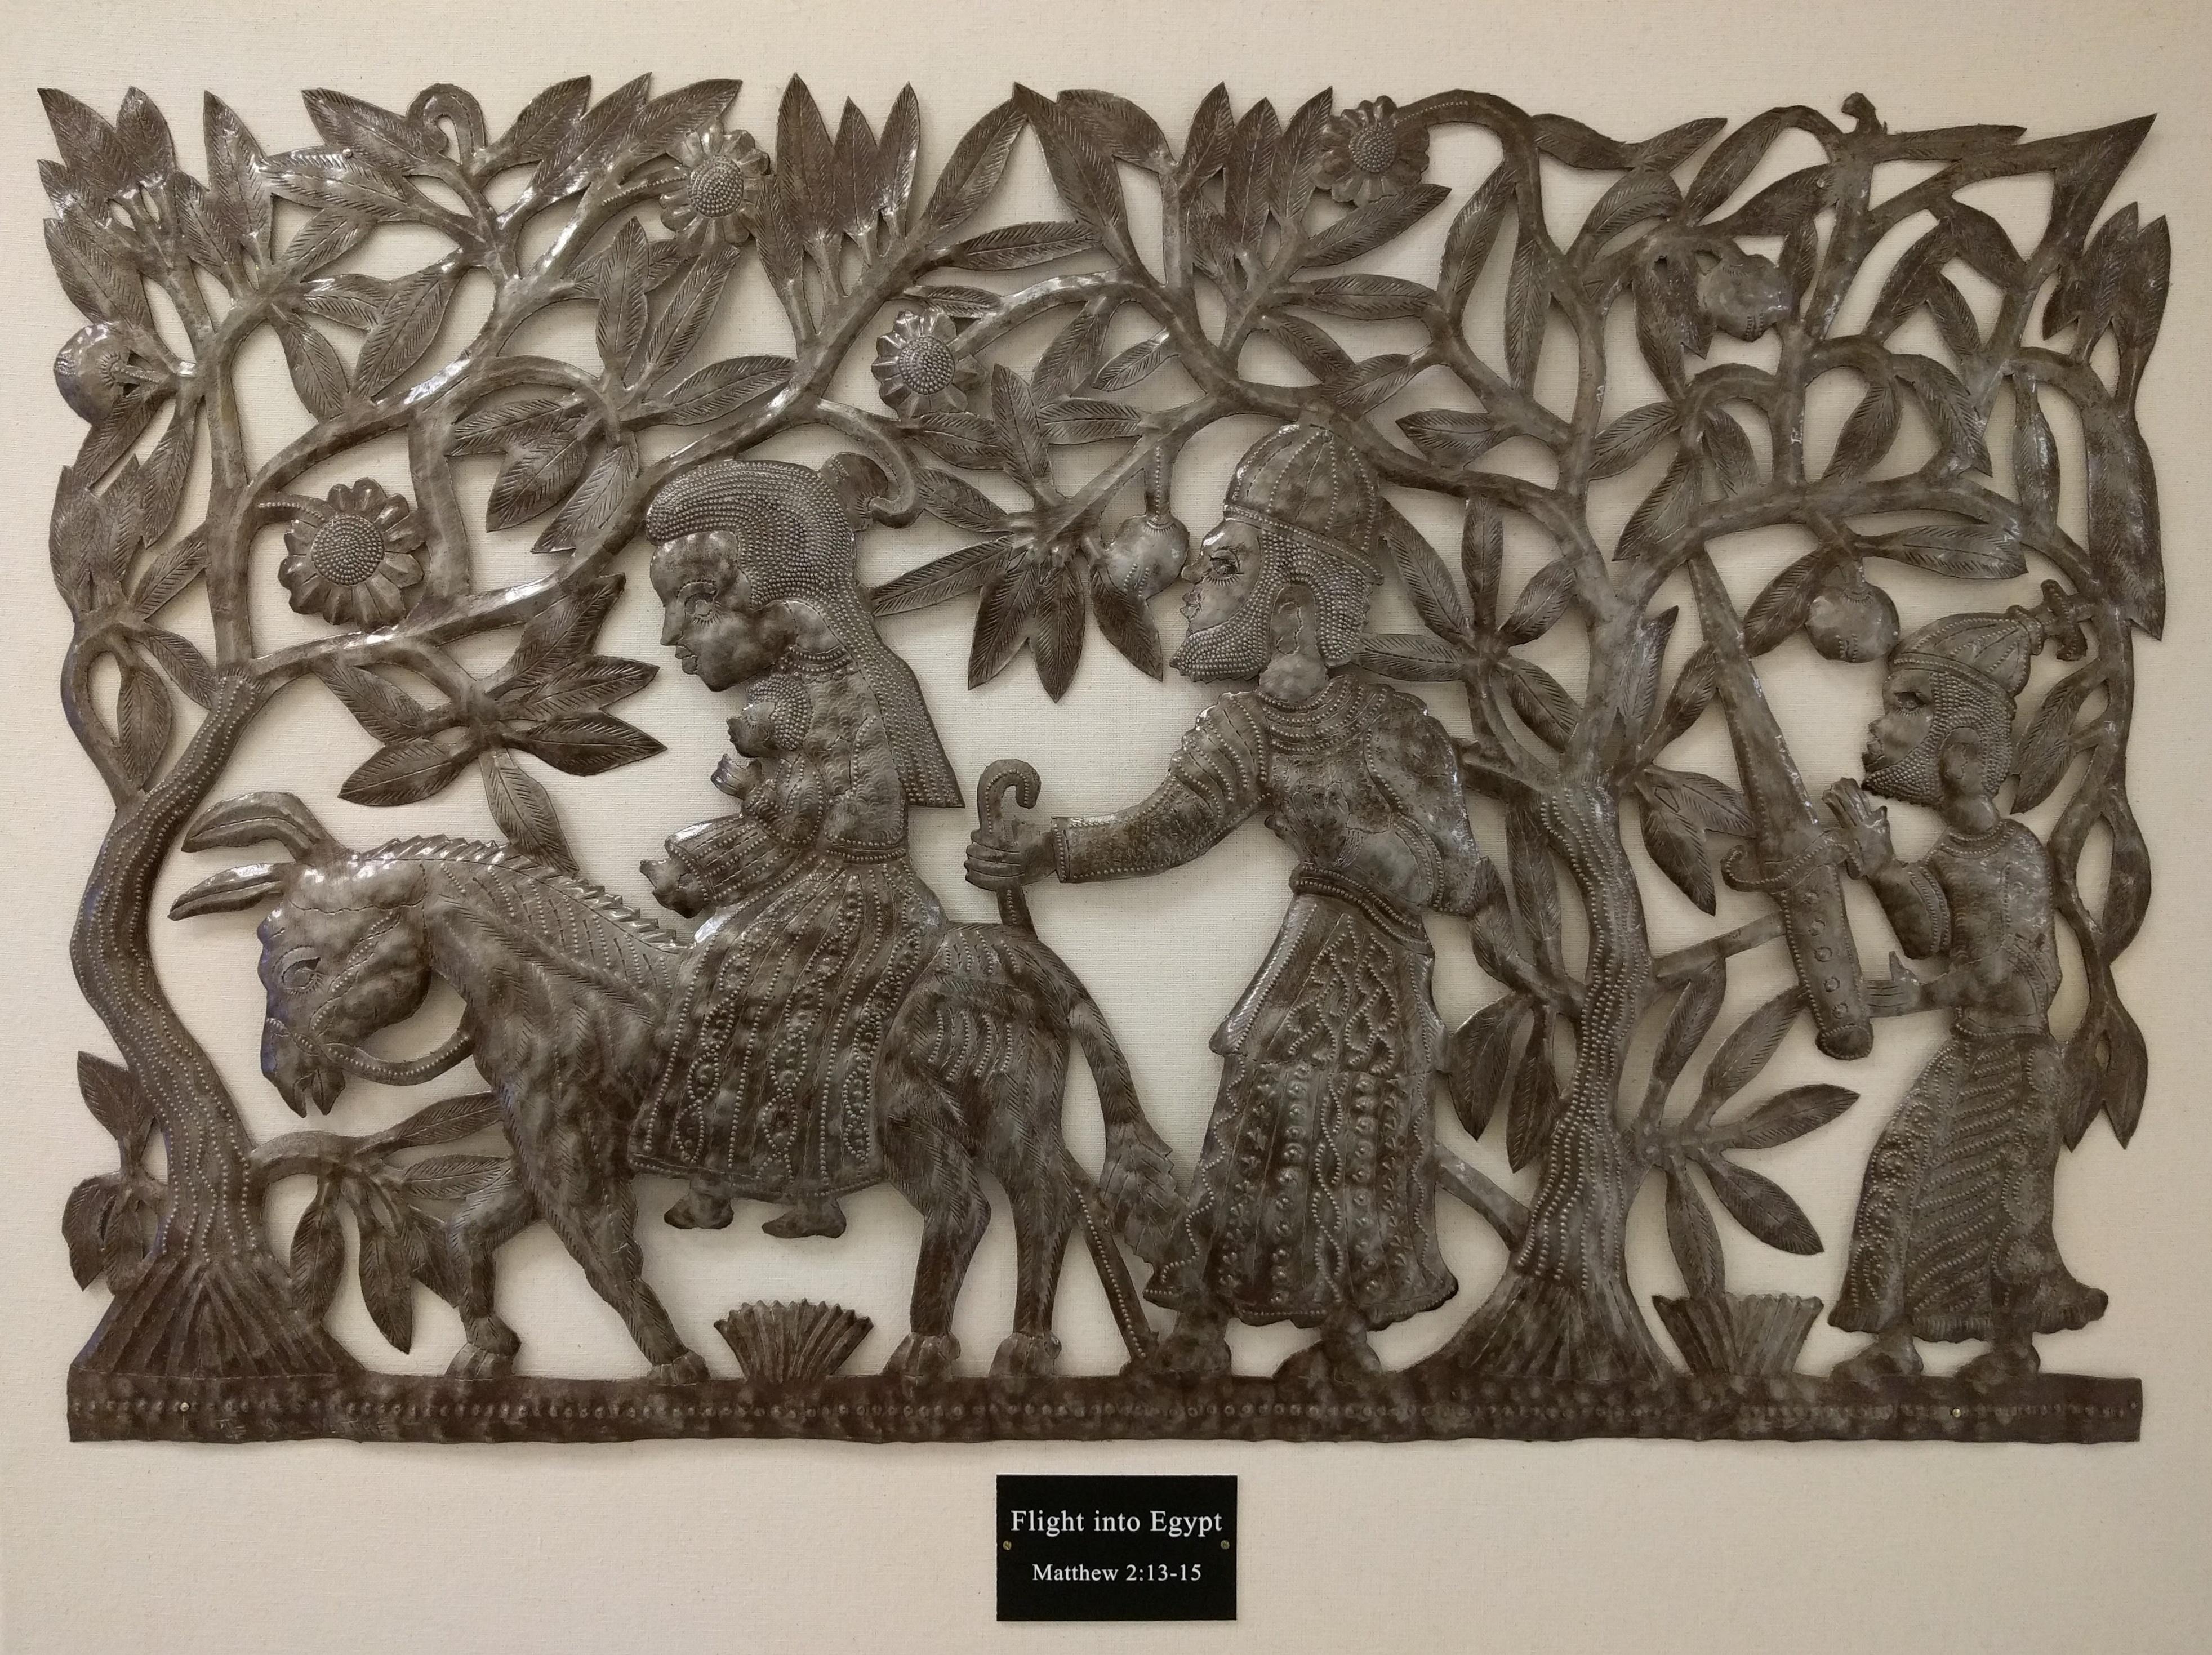 Flight into Egypt by Jean Sylvestre